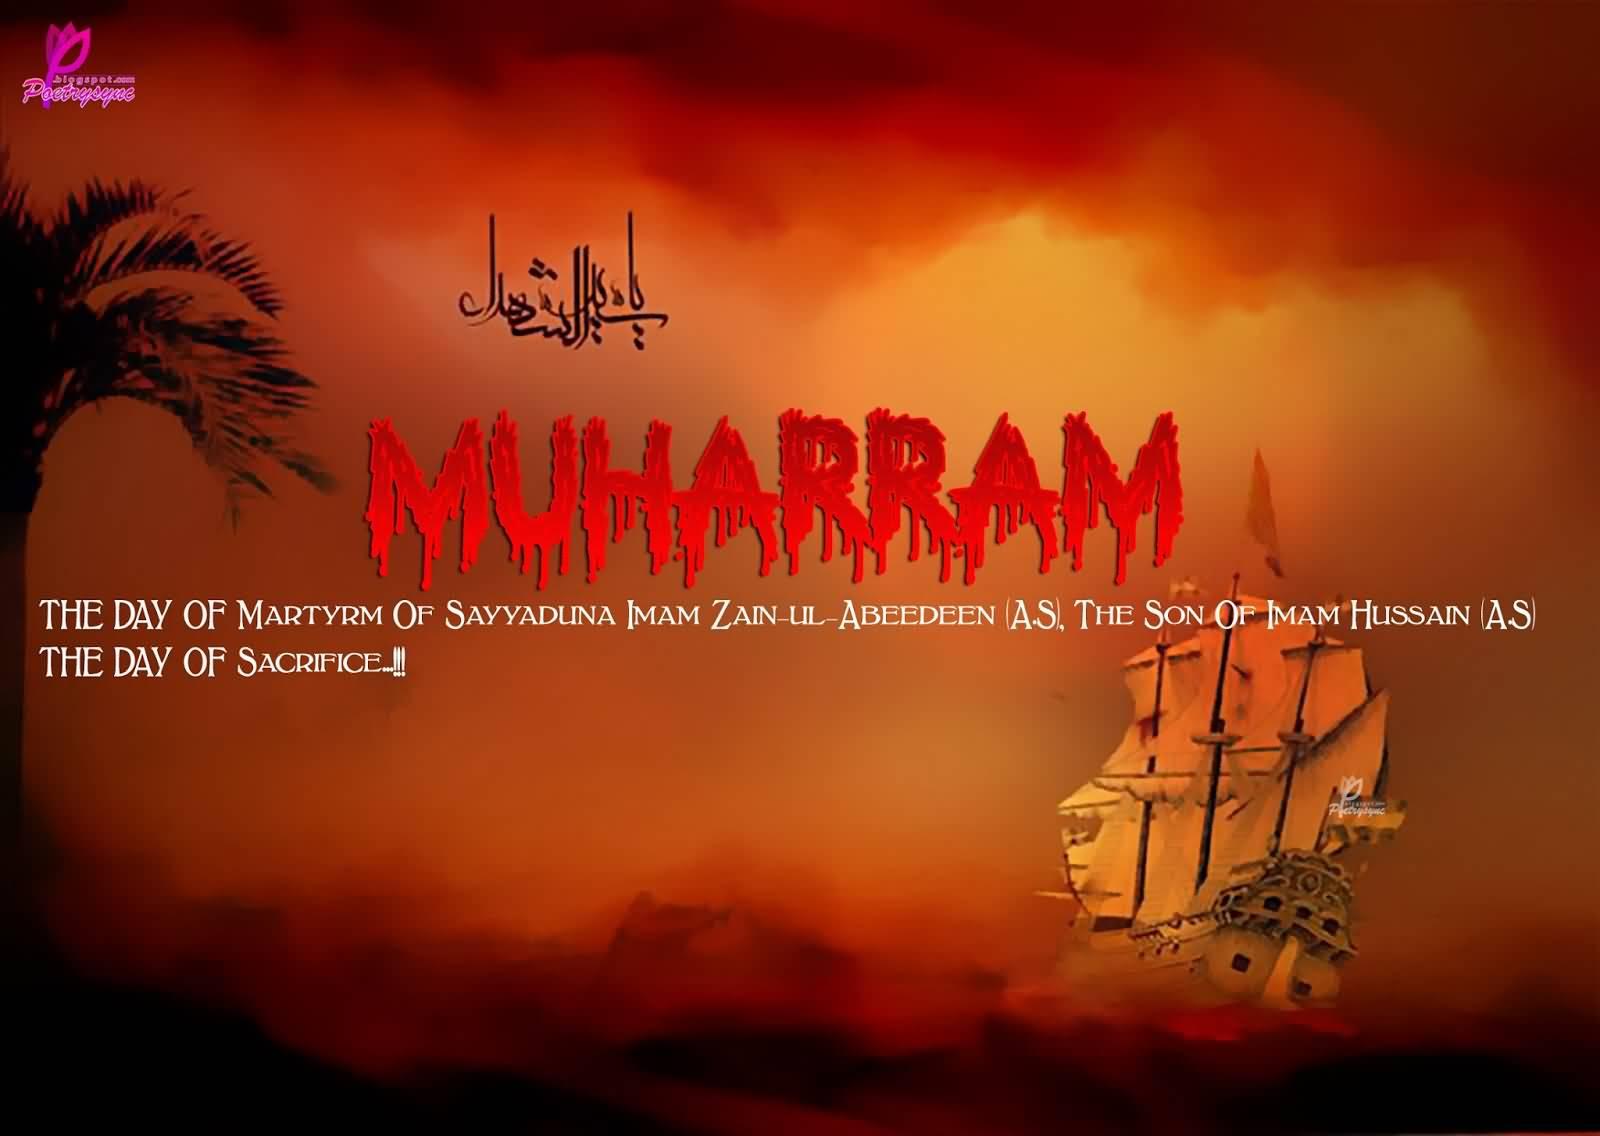 Muharram The Day Of Sacrifice